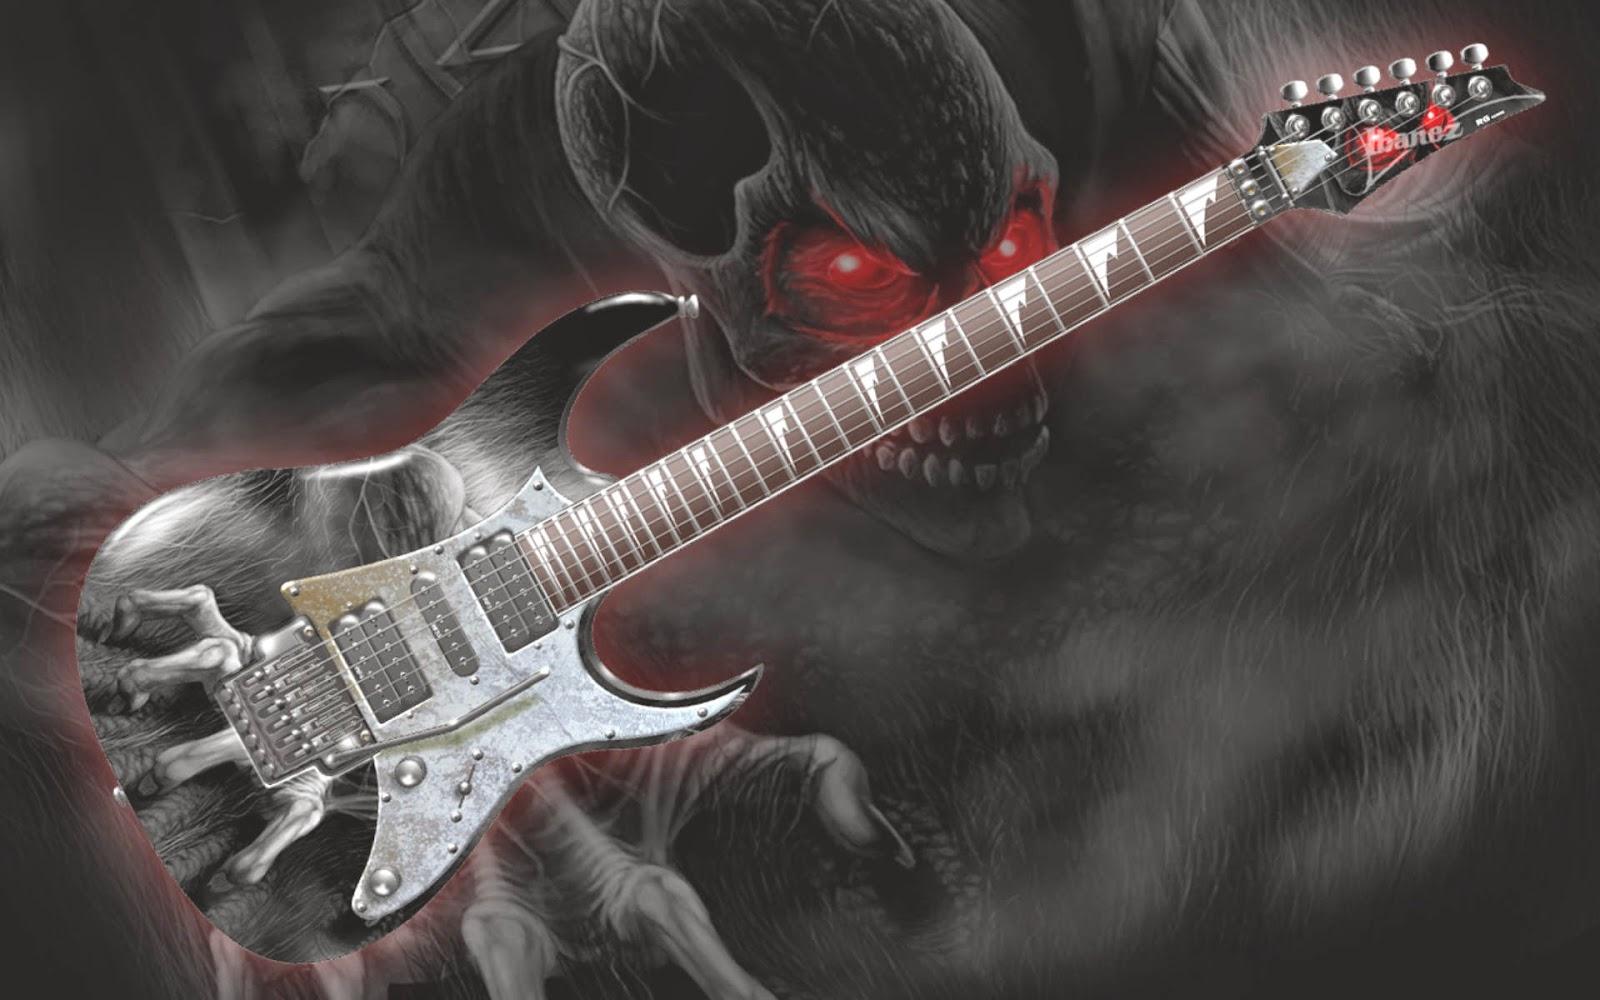 ibanez bass guitar wallpaperon - photo #9